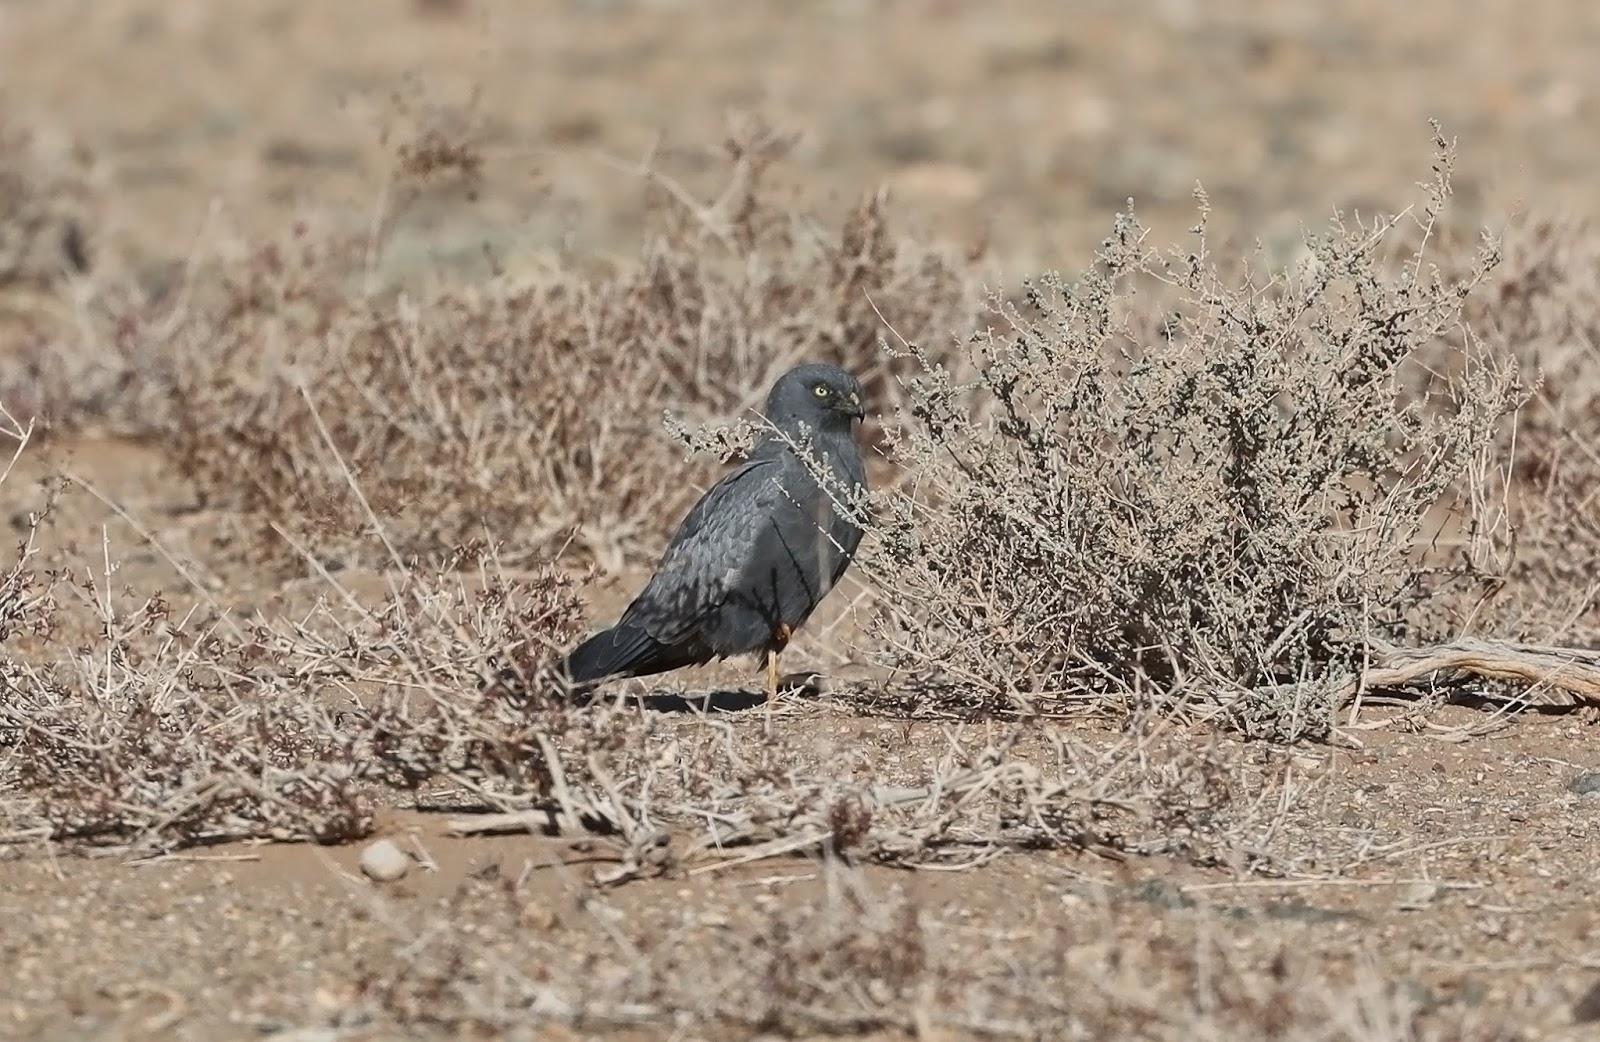 Melanistic Montagu's Harrier / Busard cendré (Circus pygargus), Oued Jenna, Aousserd, 19 March 2018 (Martin Casemore).